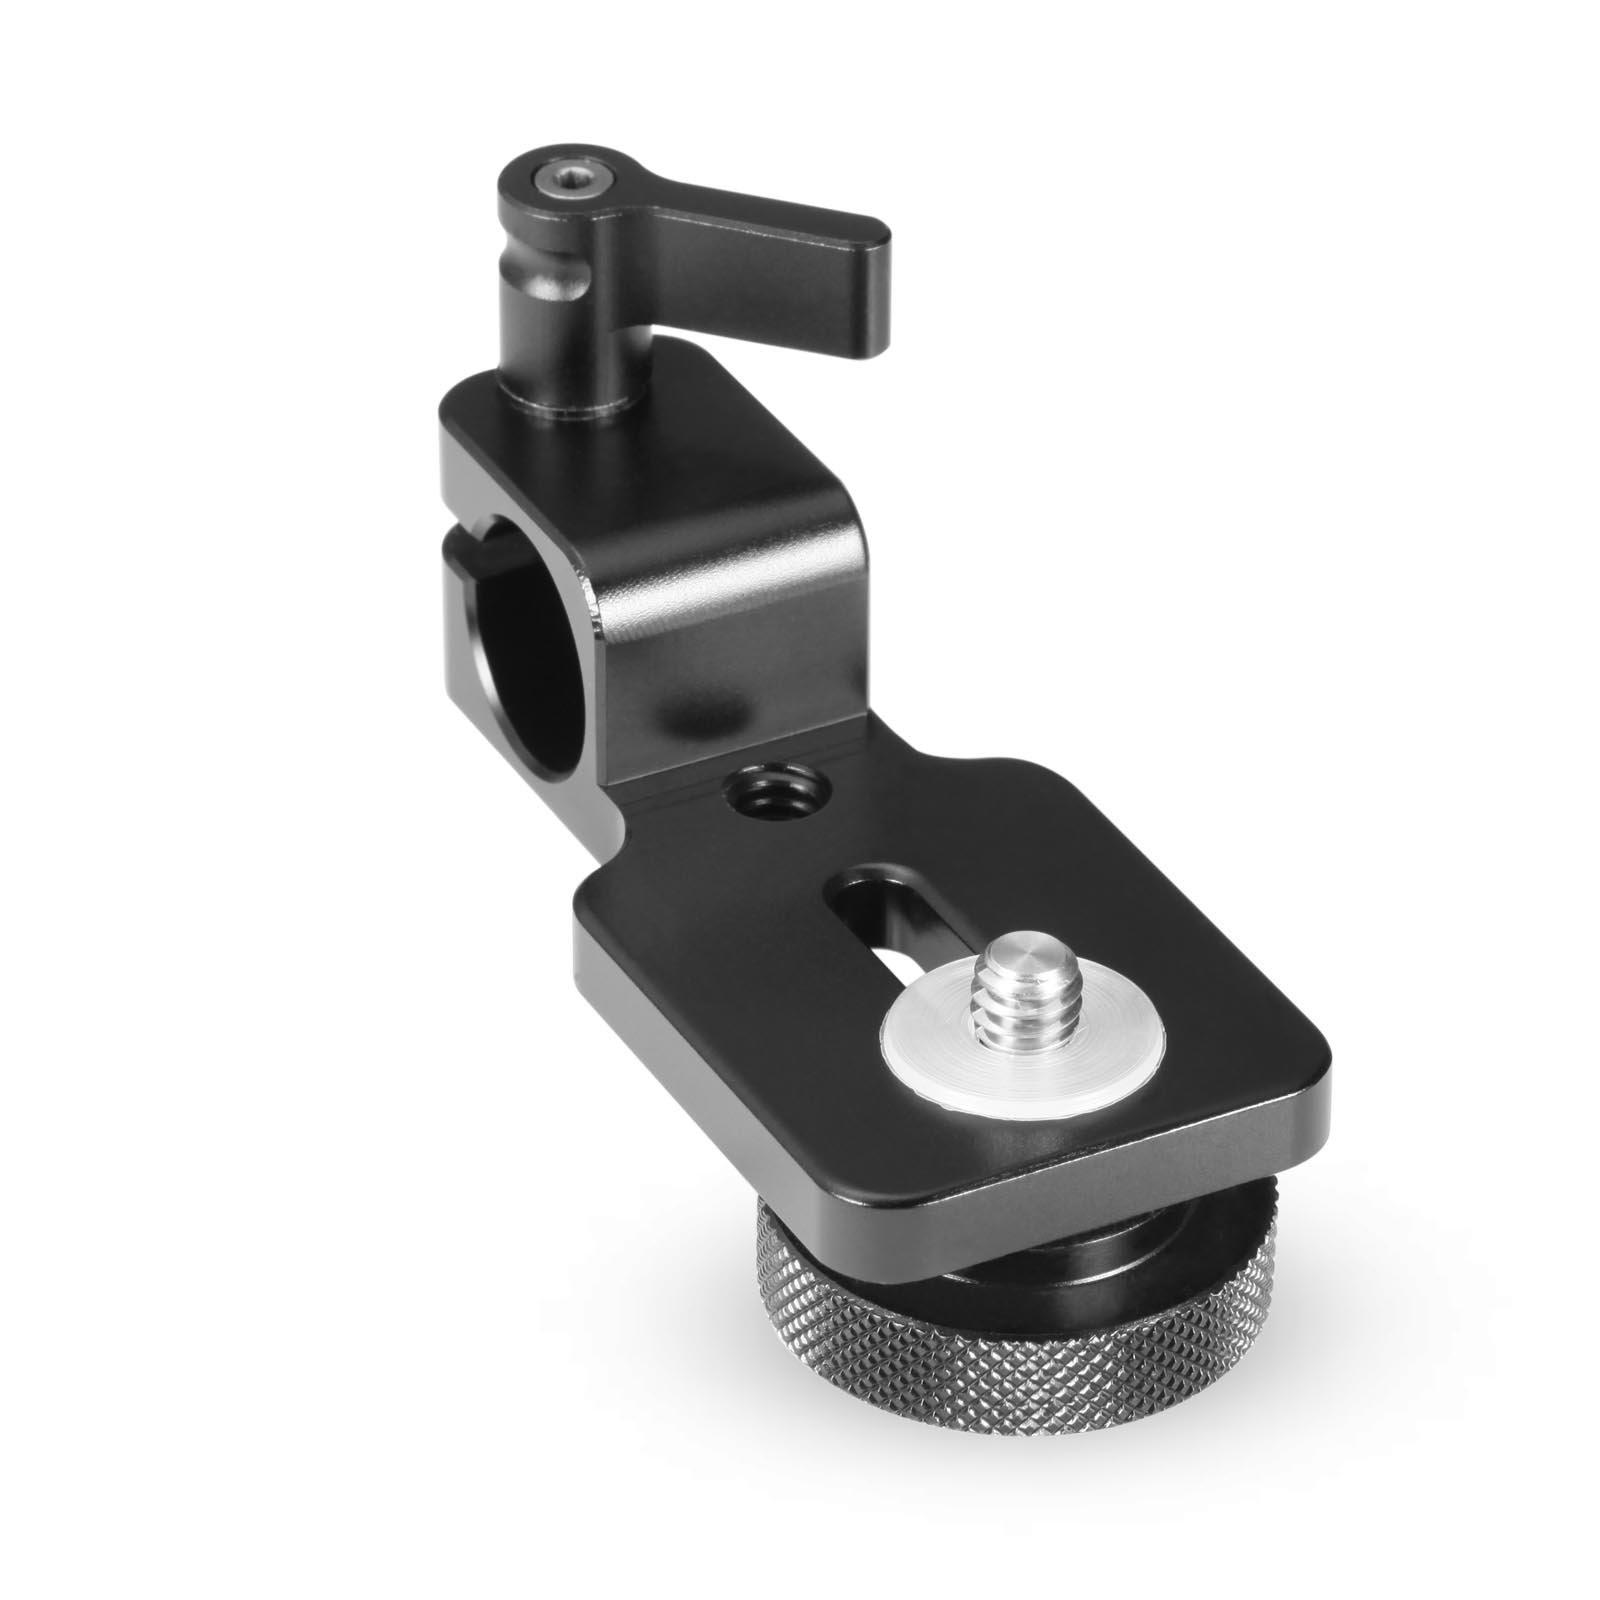 SMALLRIG 960 Quick Release Rod Mount Adjustable 15mm Rod ...